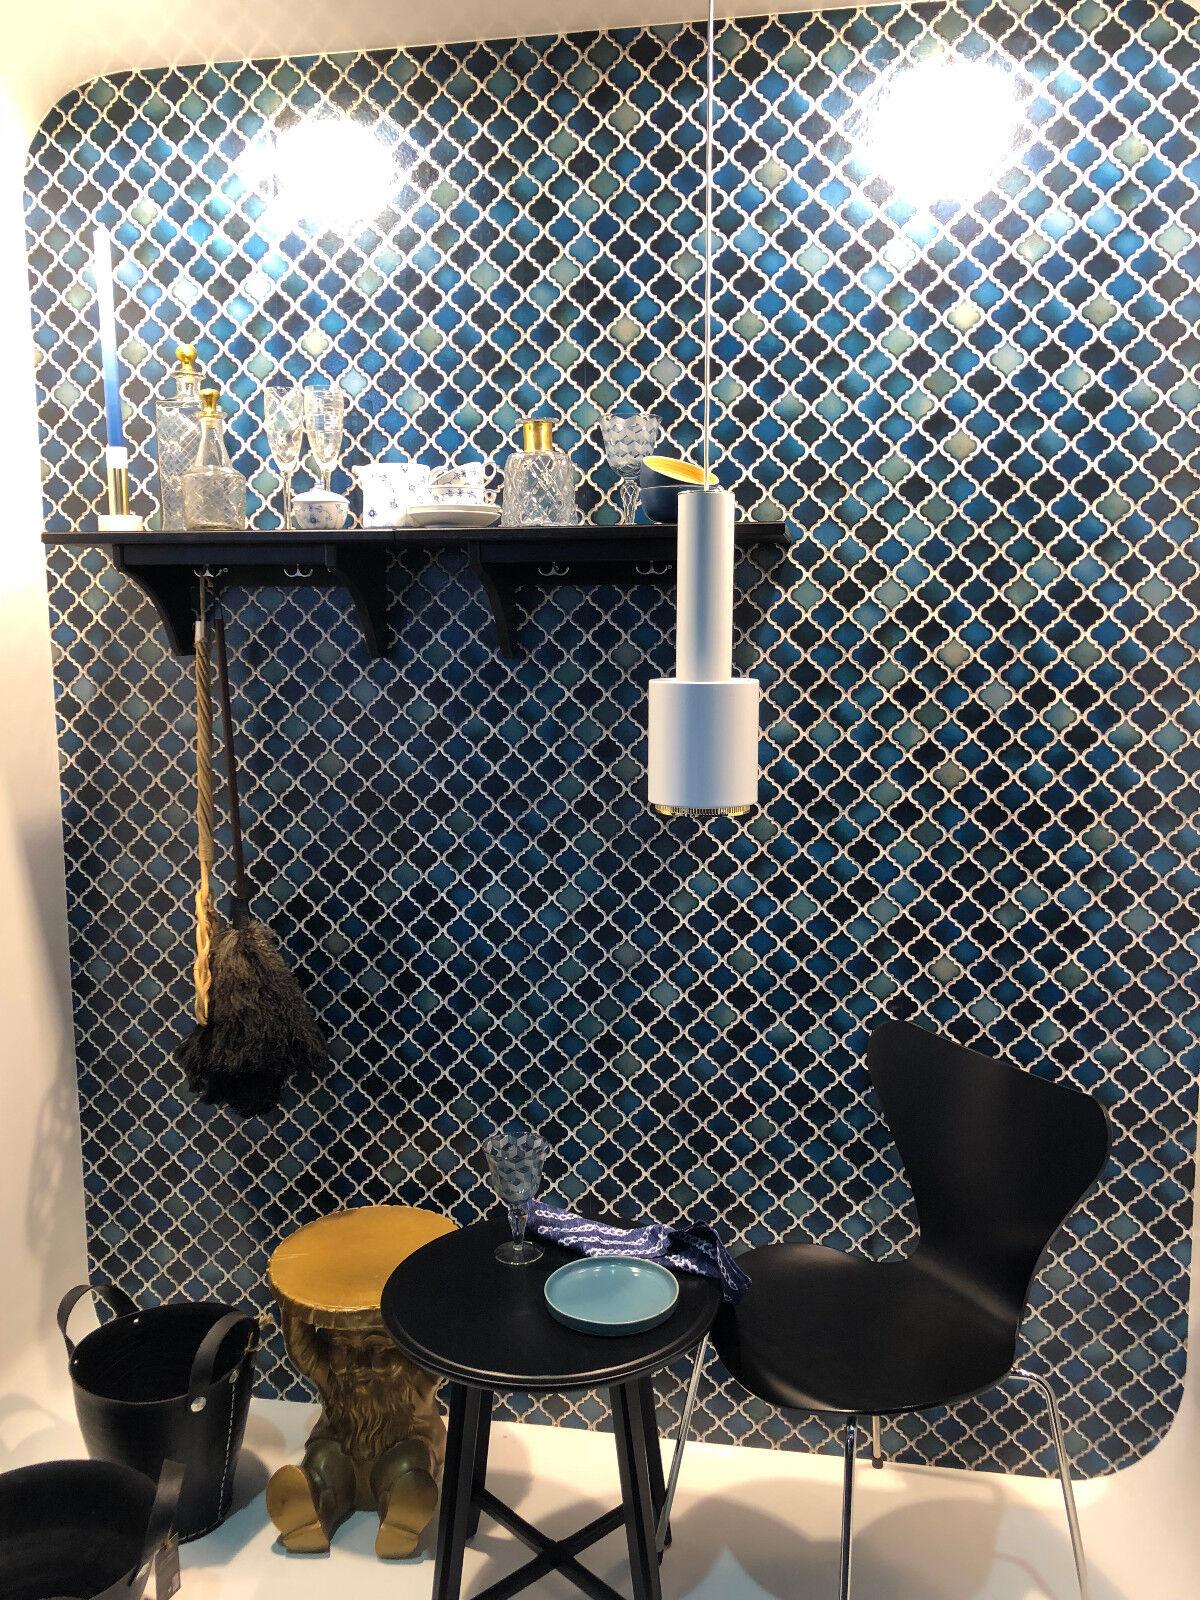 ... Vlies Tapete Stein Keramik Mosaik Fliesen Florentiner Optik Petrol  Schwarz Grau 4 ...